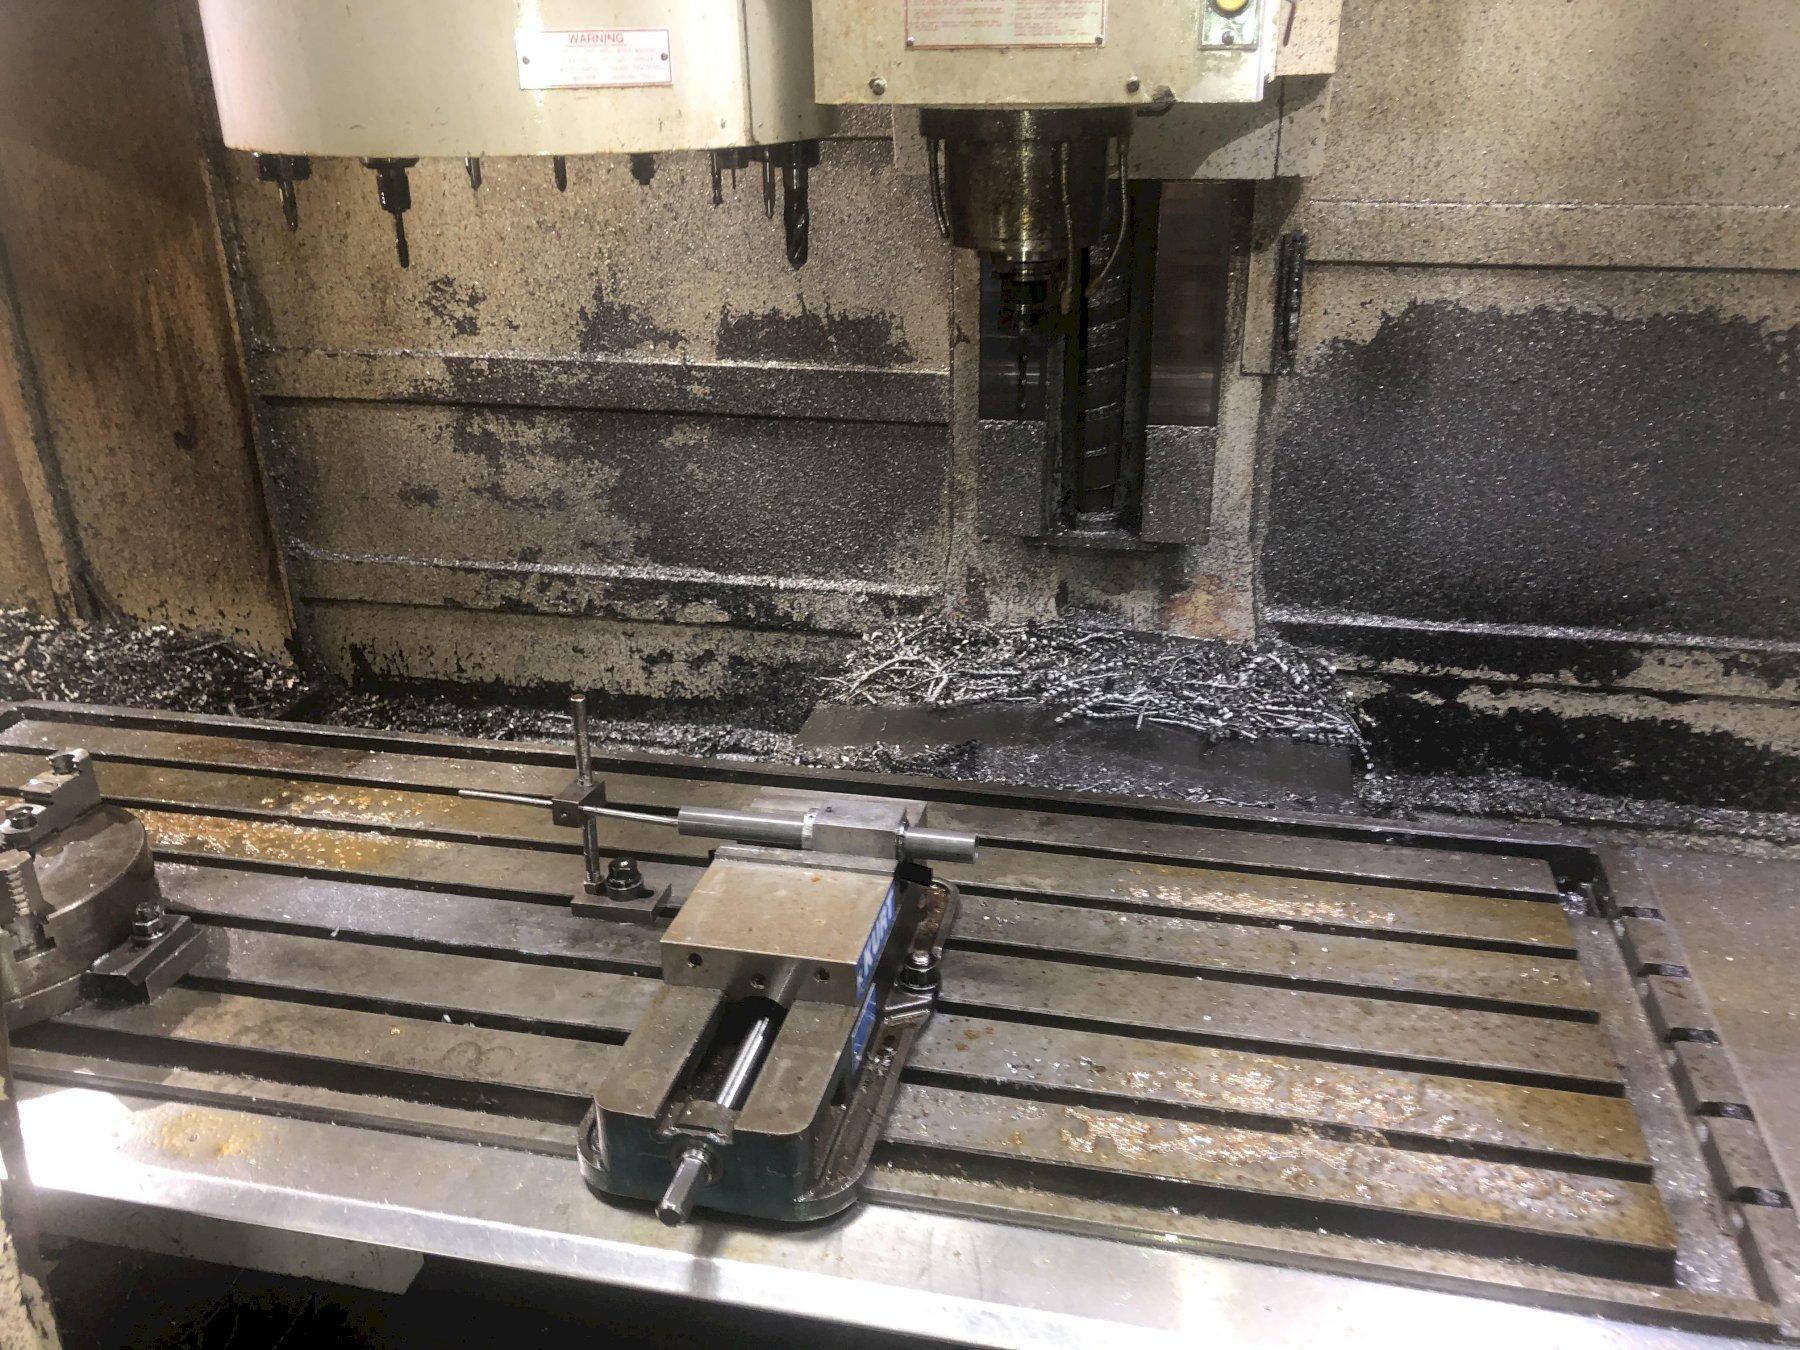 Milltronics Model RH30 CNC Vertical Machining Center, Serial #8652, New 2005. Must move make offer!